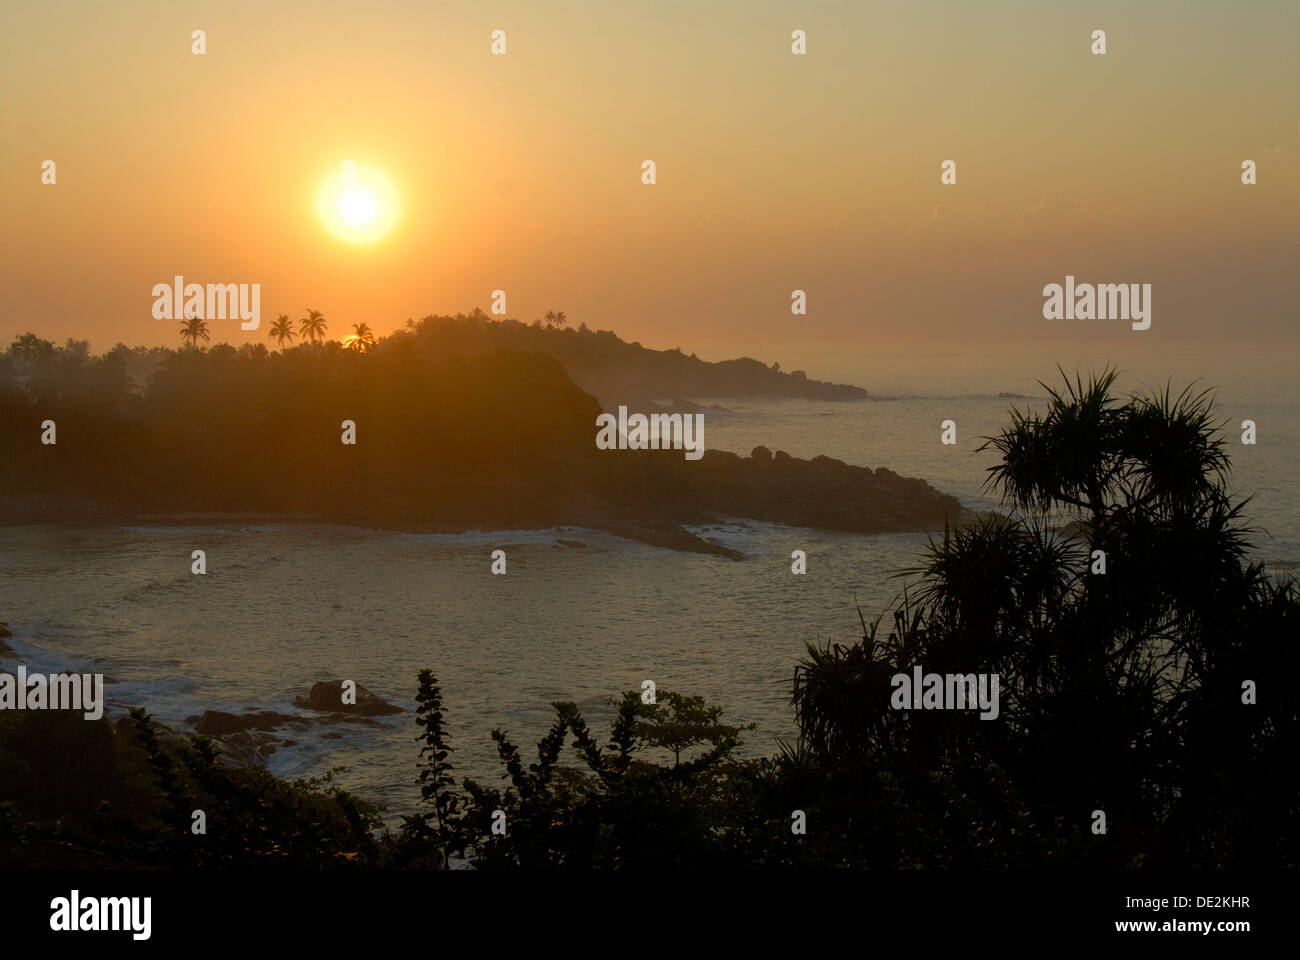 Sunrise over a bay, at Talalla Dondra, Indian Ocean, Ceylon, Sri Lanka, South Asia, Asia - Stock Image